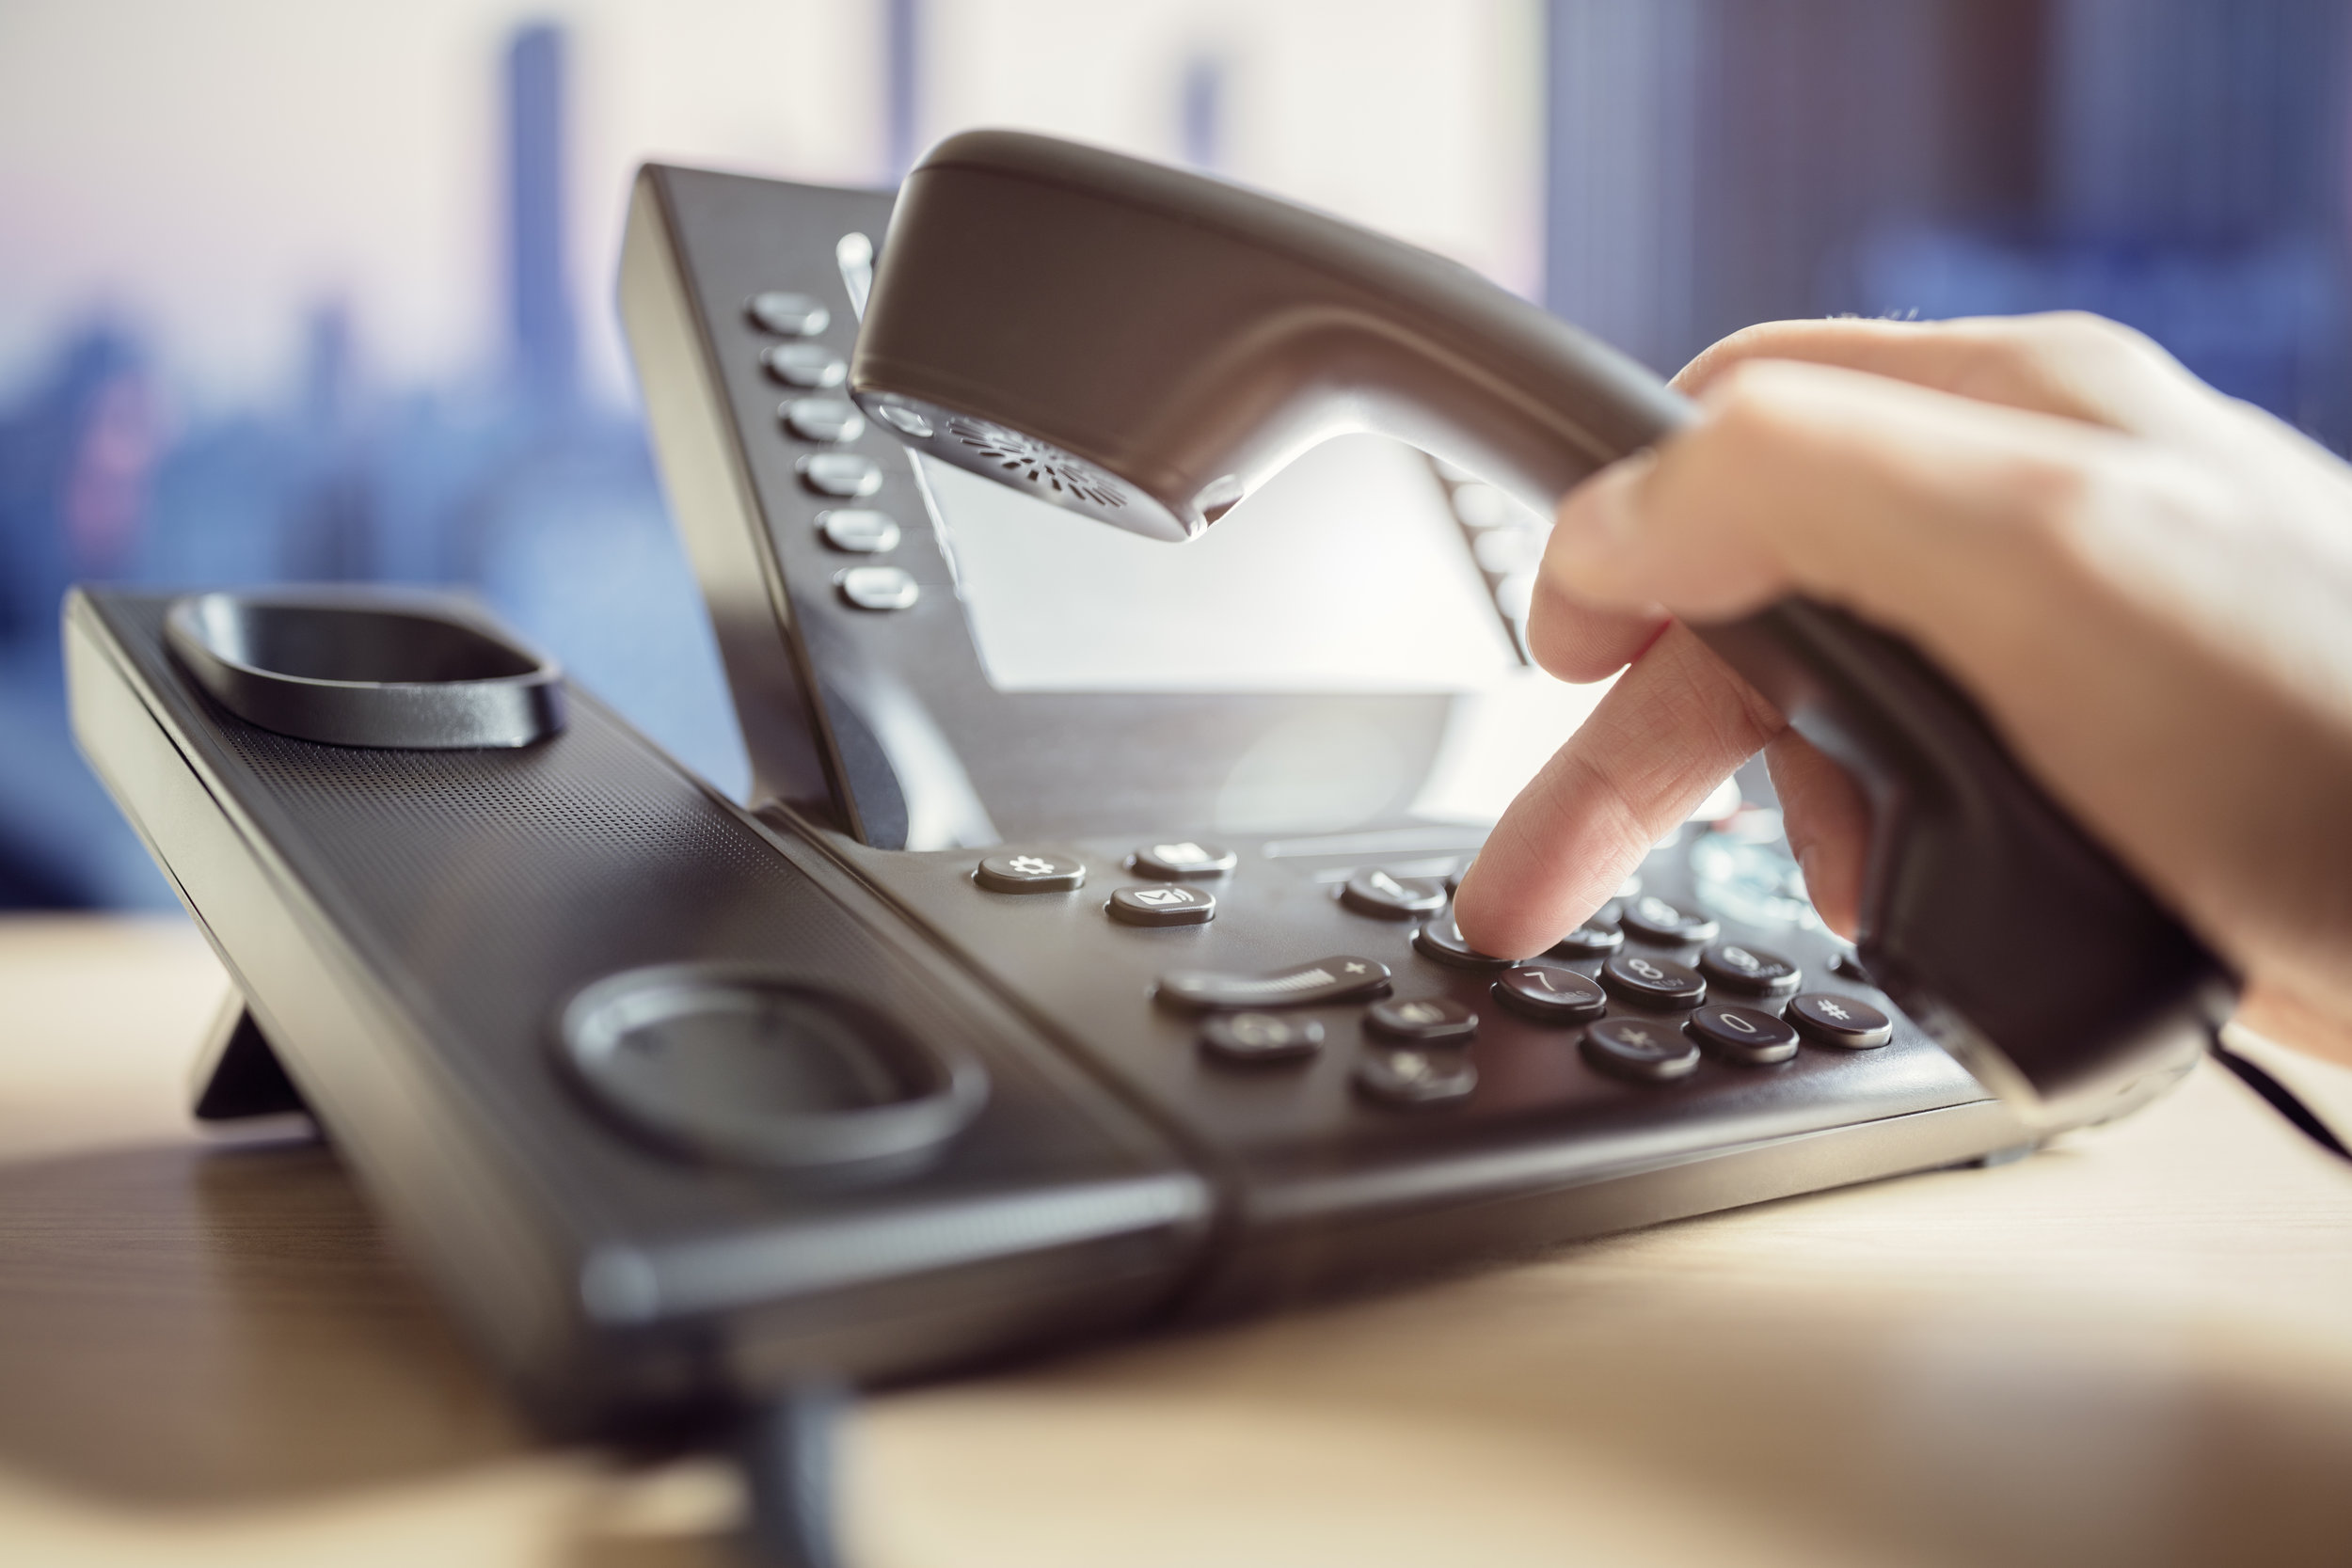 bigstock-Dialing-telephone-keypad-conce-168083717.jpg